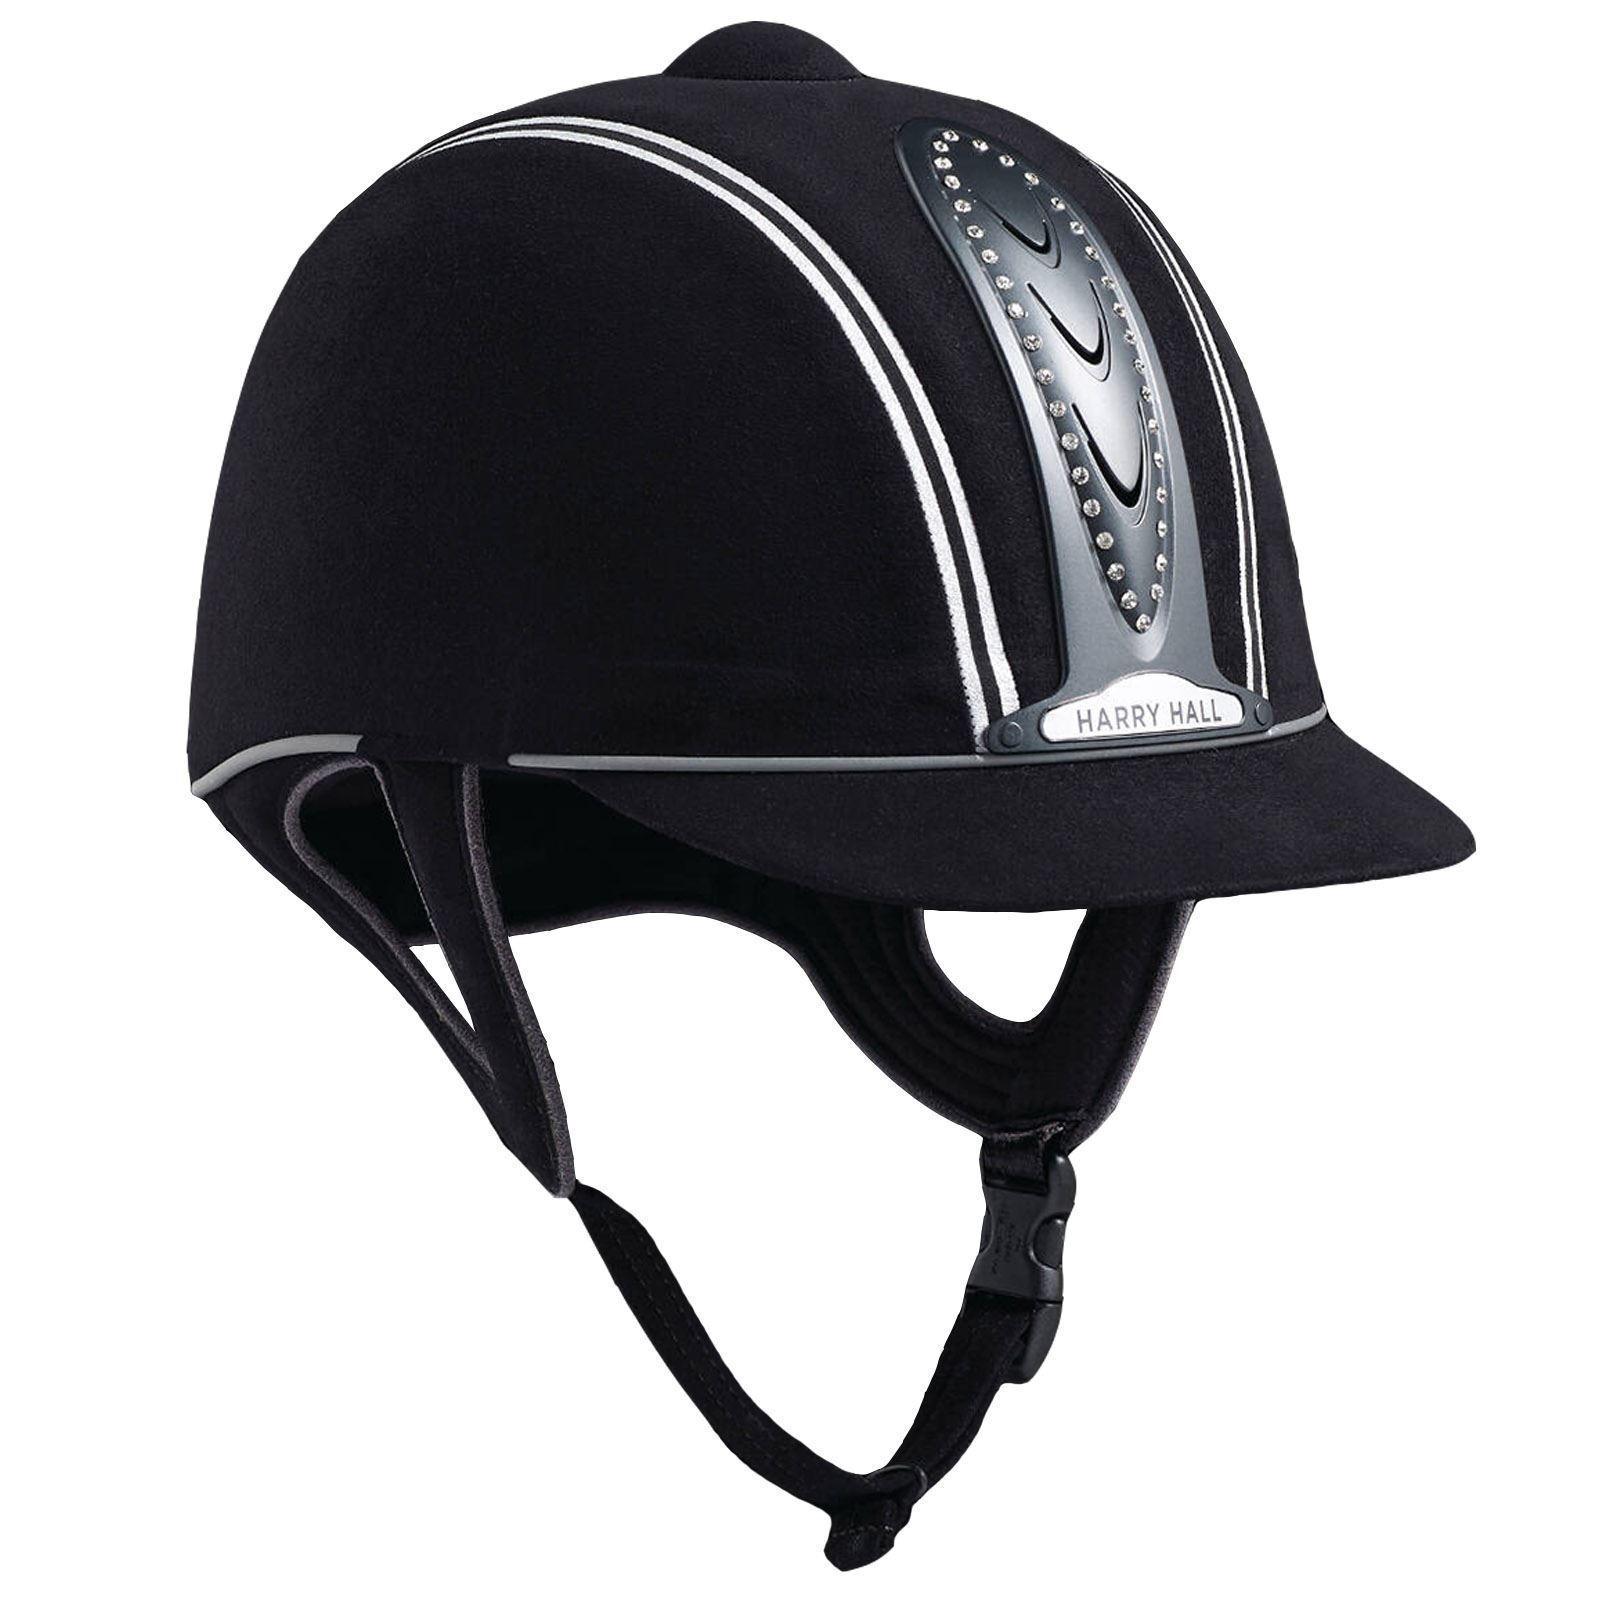 Harry Hall Legend Crystal Plus Junior Pas015 Lightweight Safety Horse Riding Hat